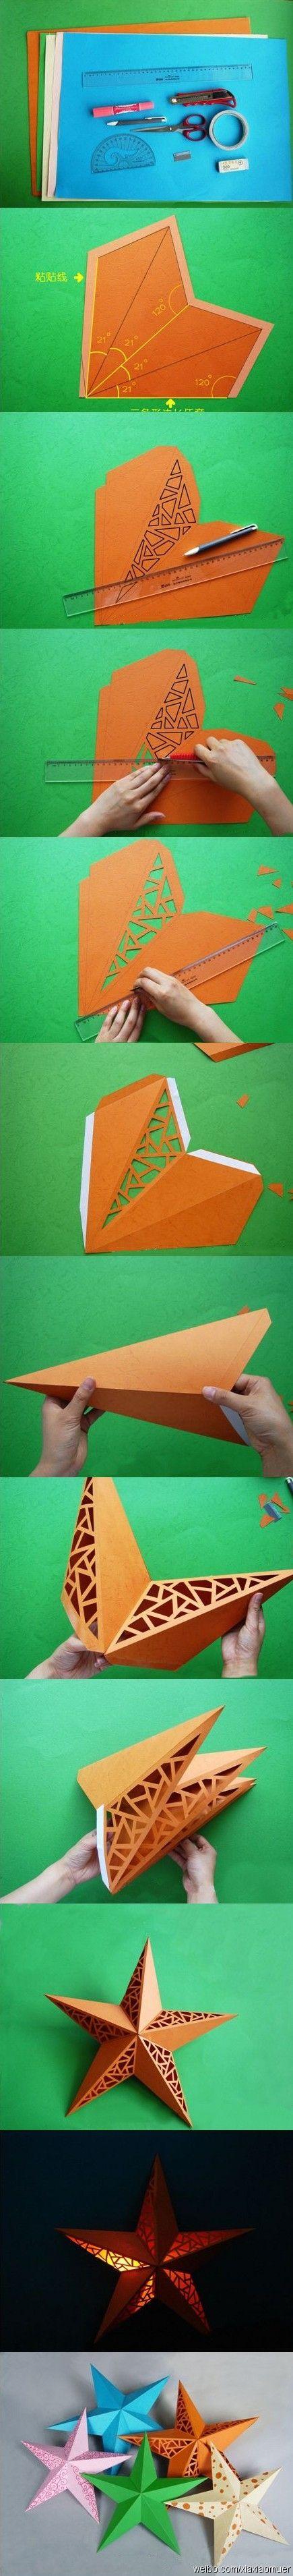 DIY paper star lantern for Diwali - Indian festival